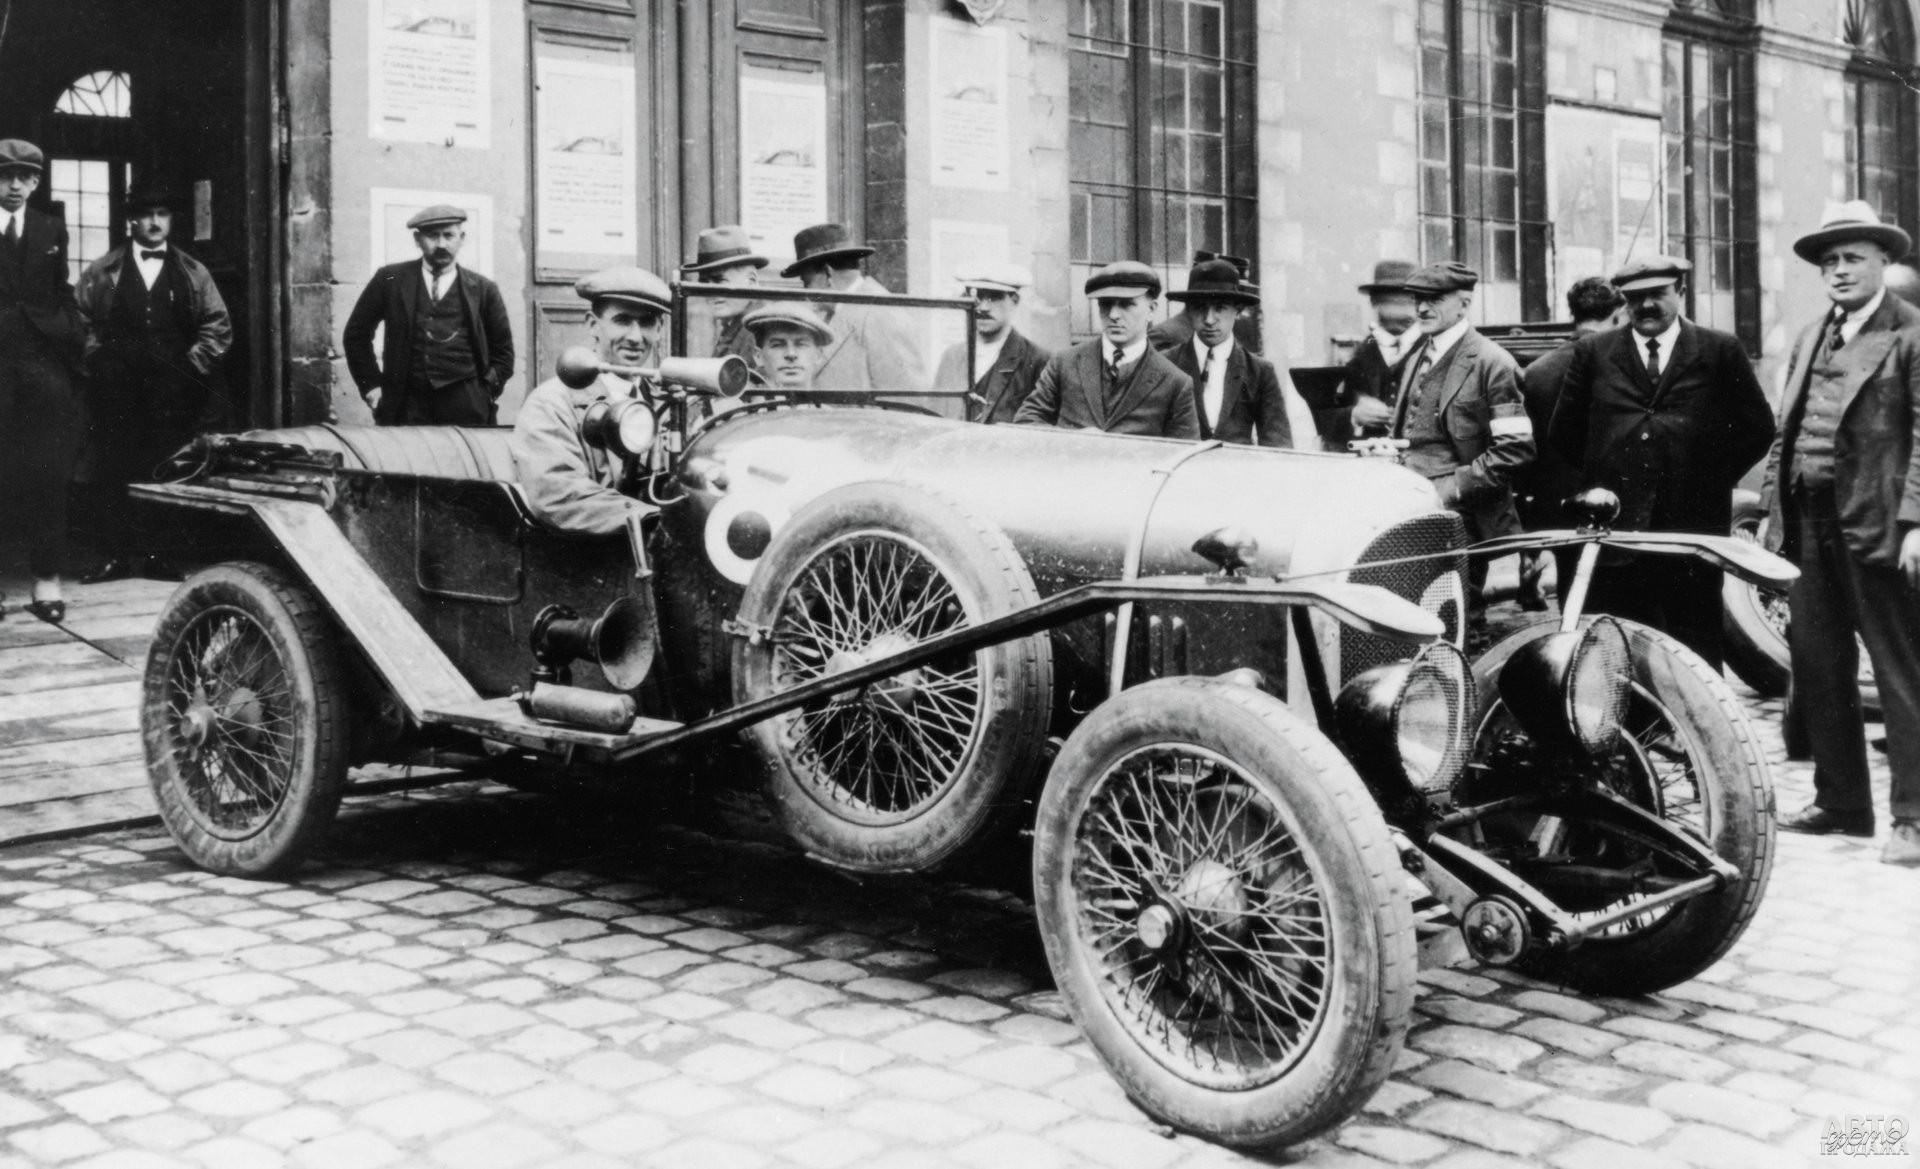 Вольф Барнато и Глен Кидстон – покорители Ле-Мана 1930 года